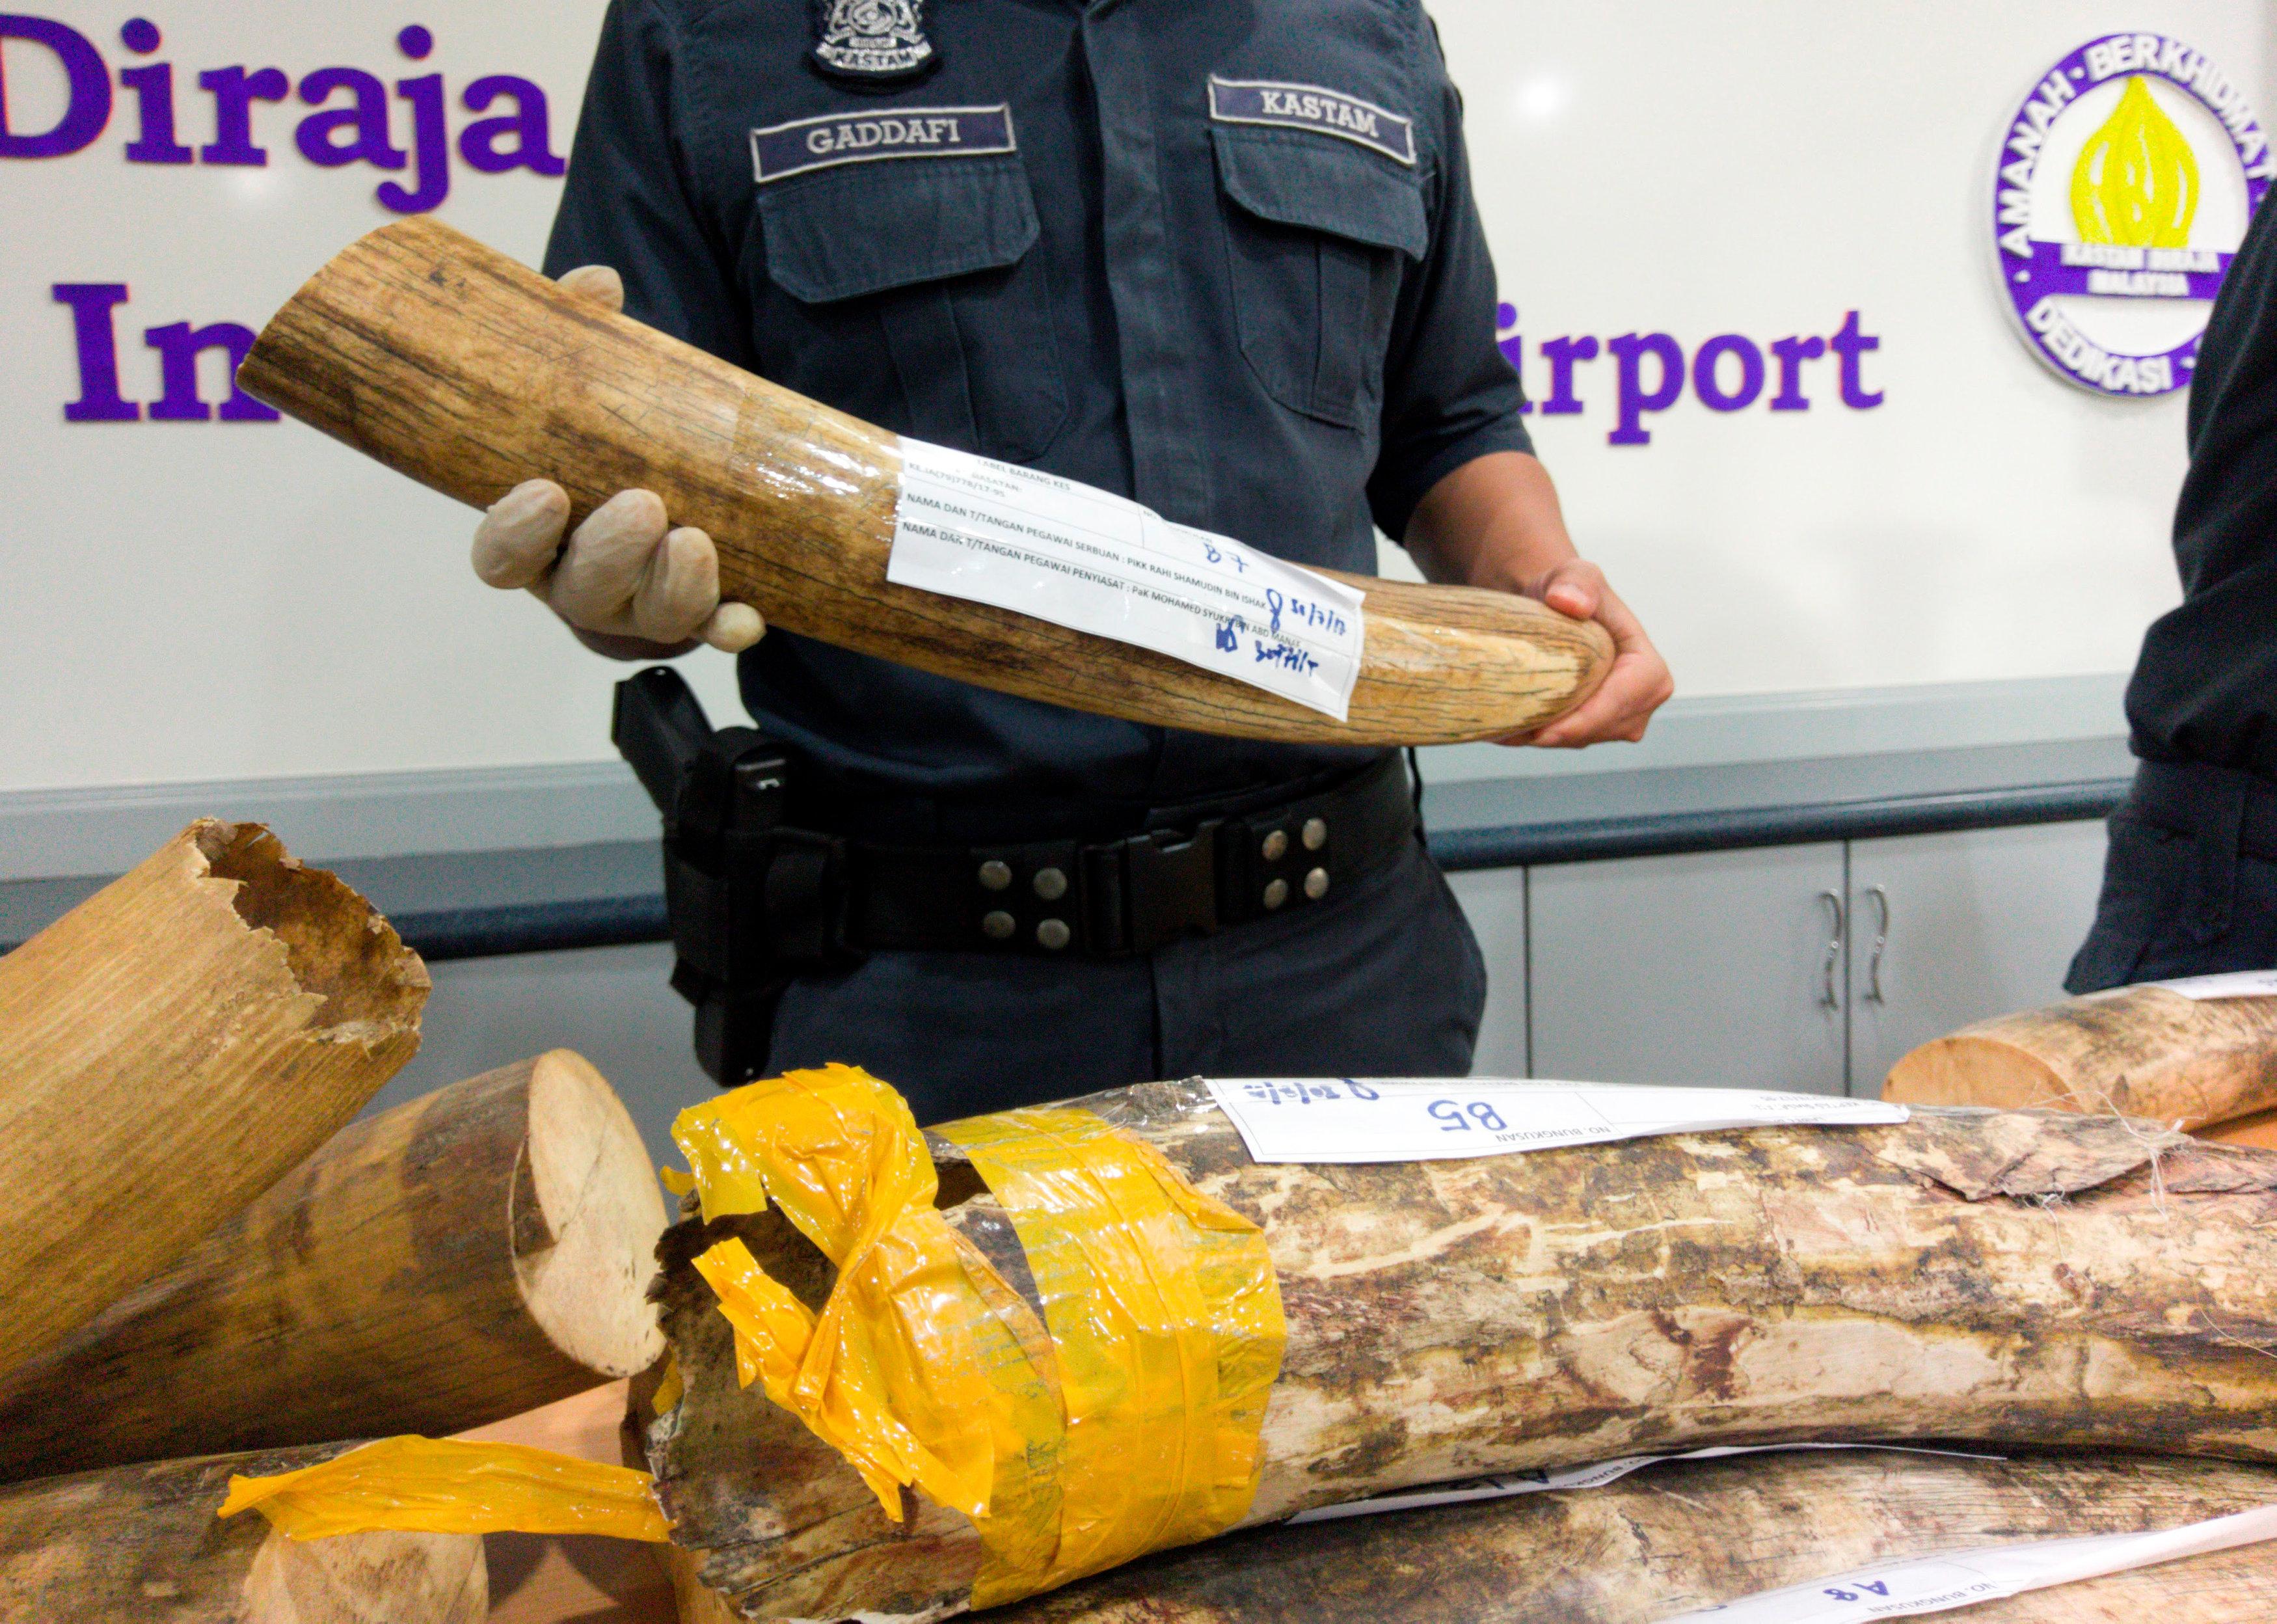 Malaysia seizes trafficked ivory tusks, pangolin scales worth nearly $1 million